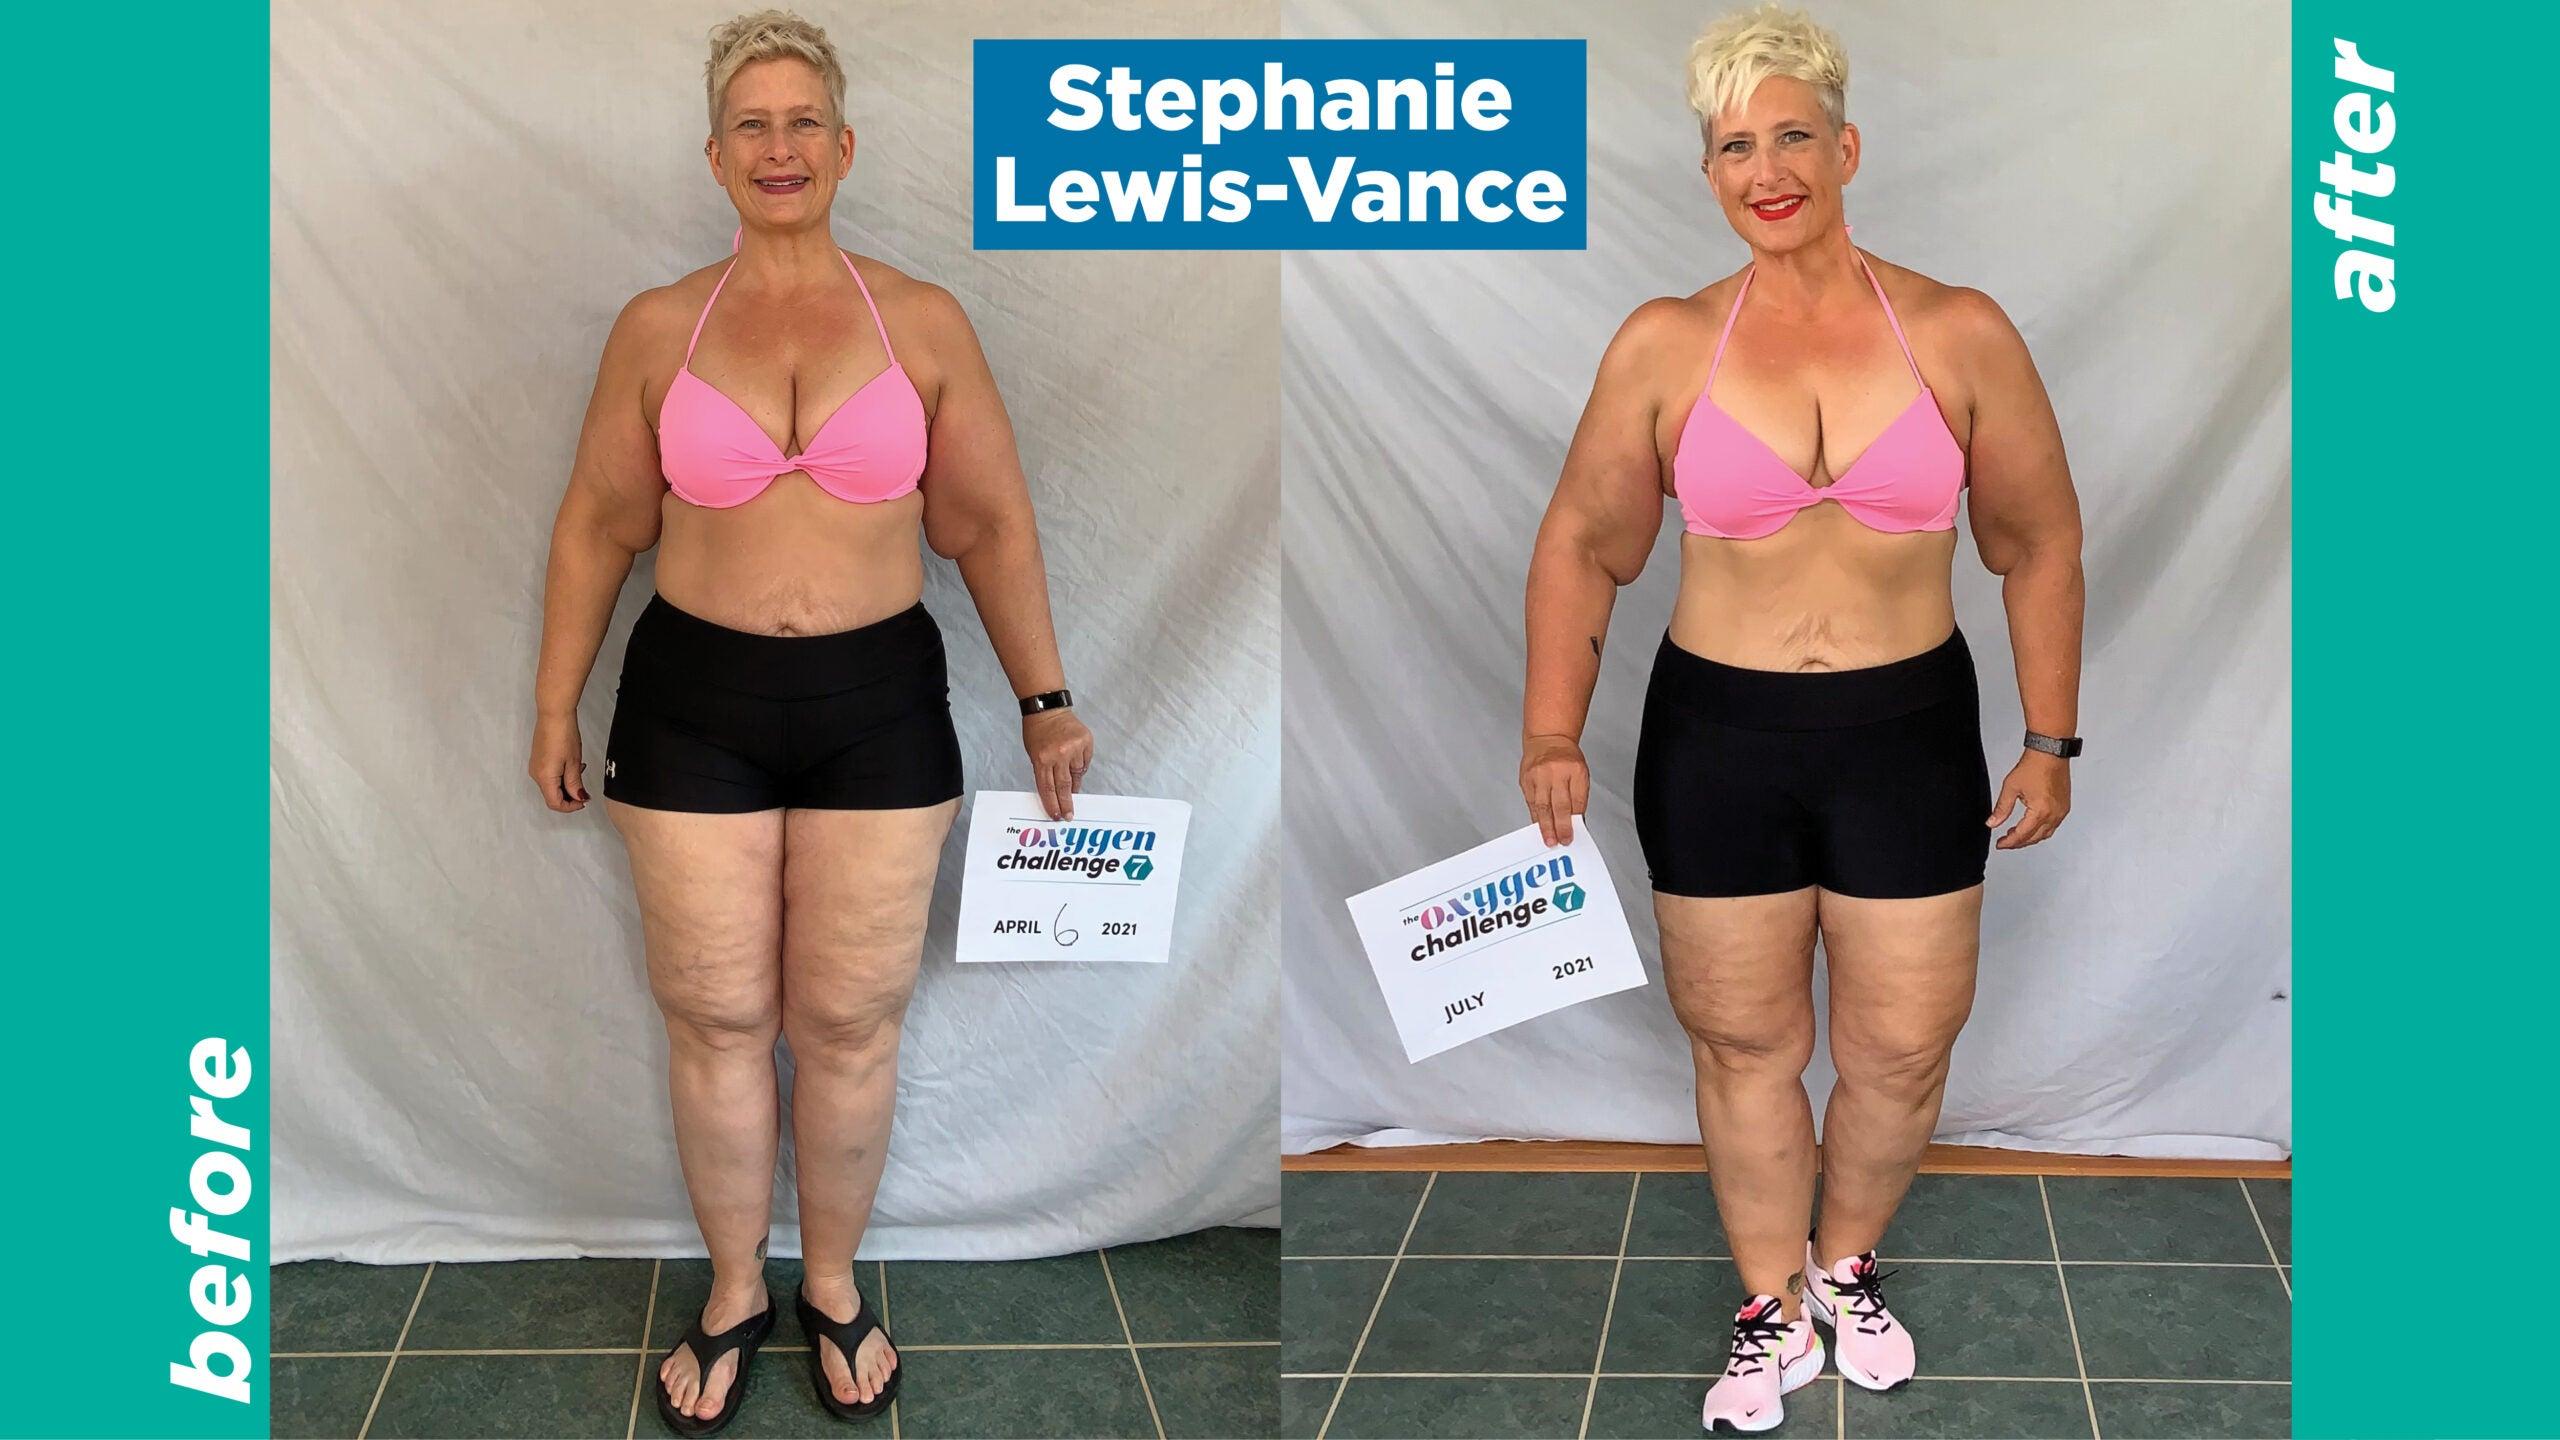 Stephanie Lewis-Vance